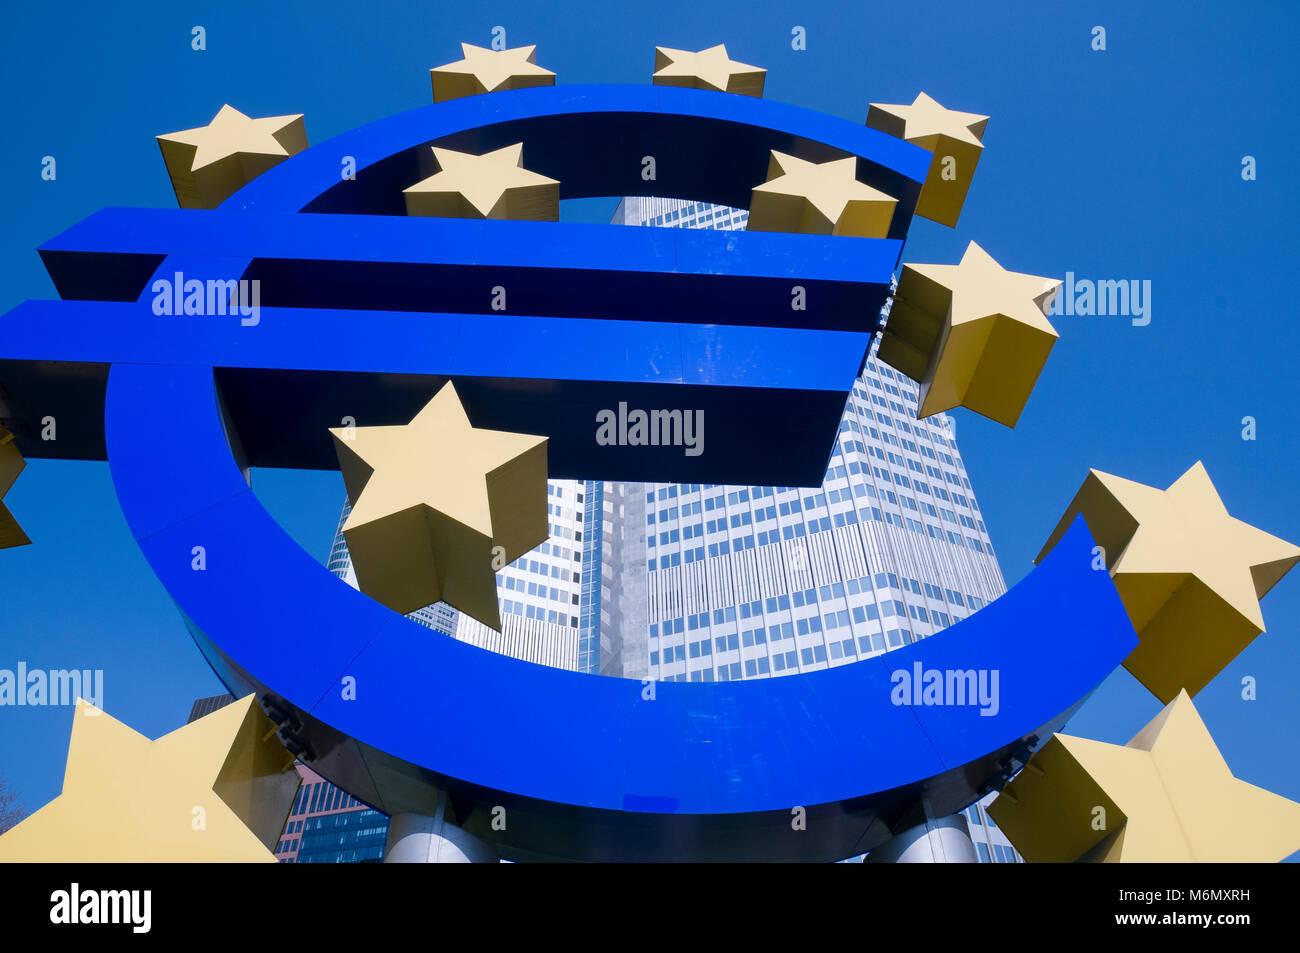 Alte EZB, Europäische Zentralbank, Frankfurt, Hessen, Deutschland, Europa - Stock Image